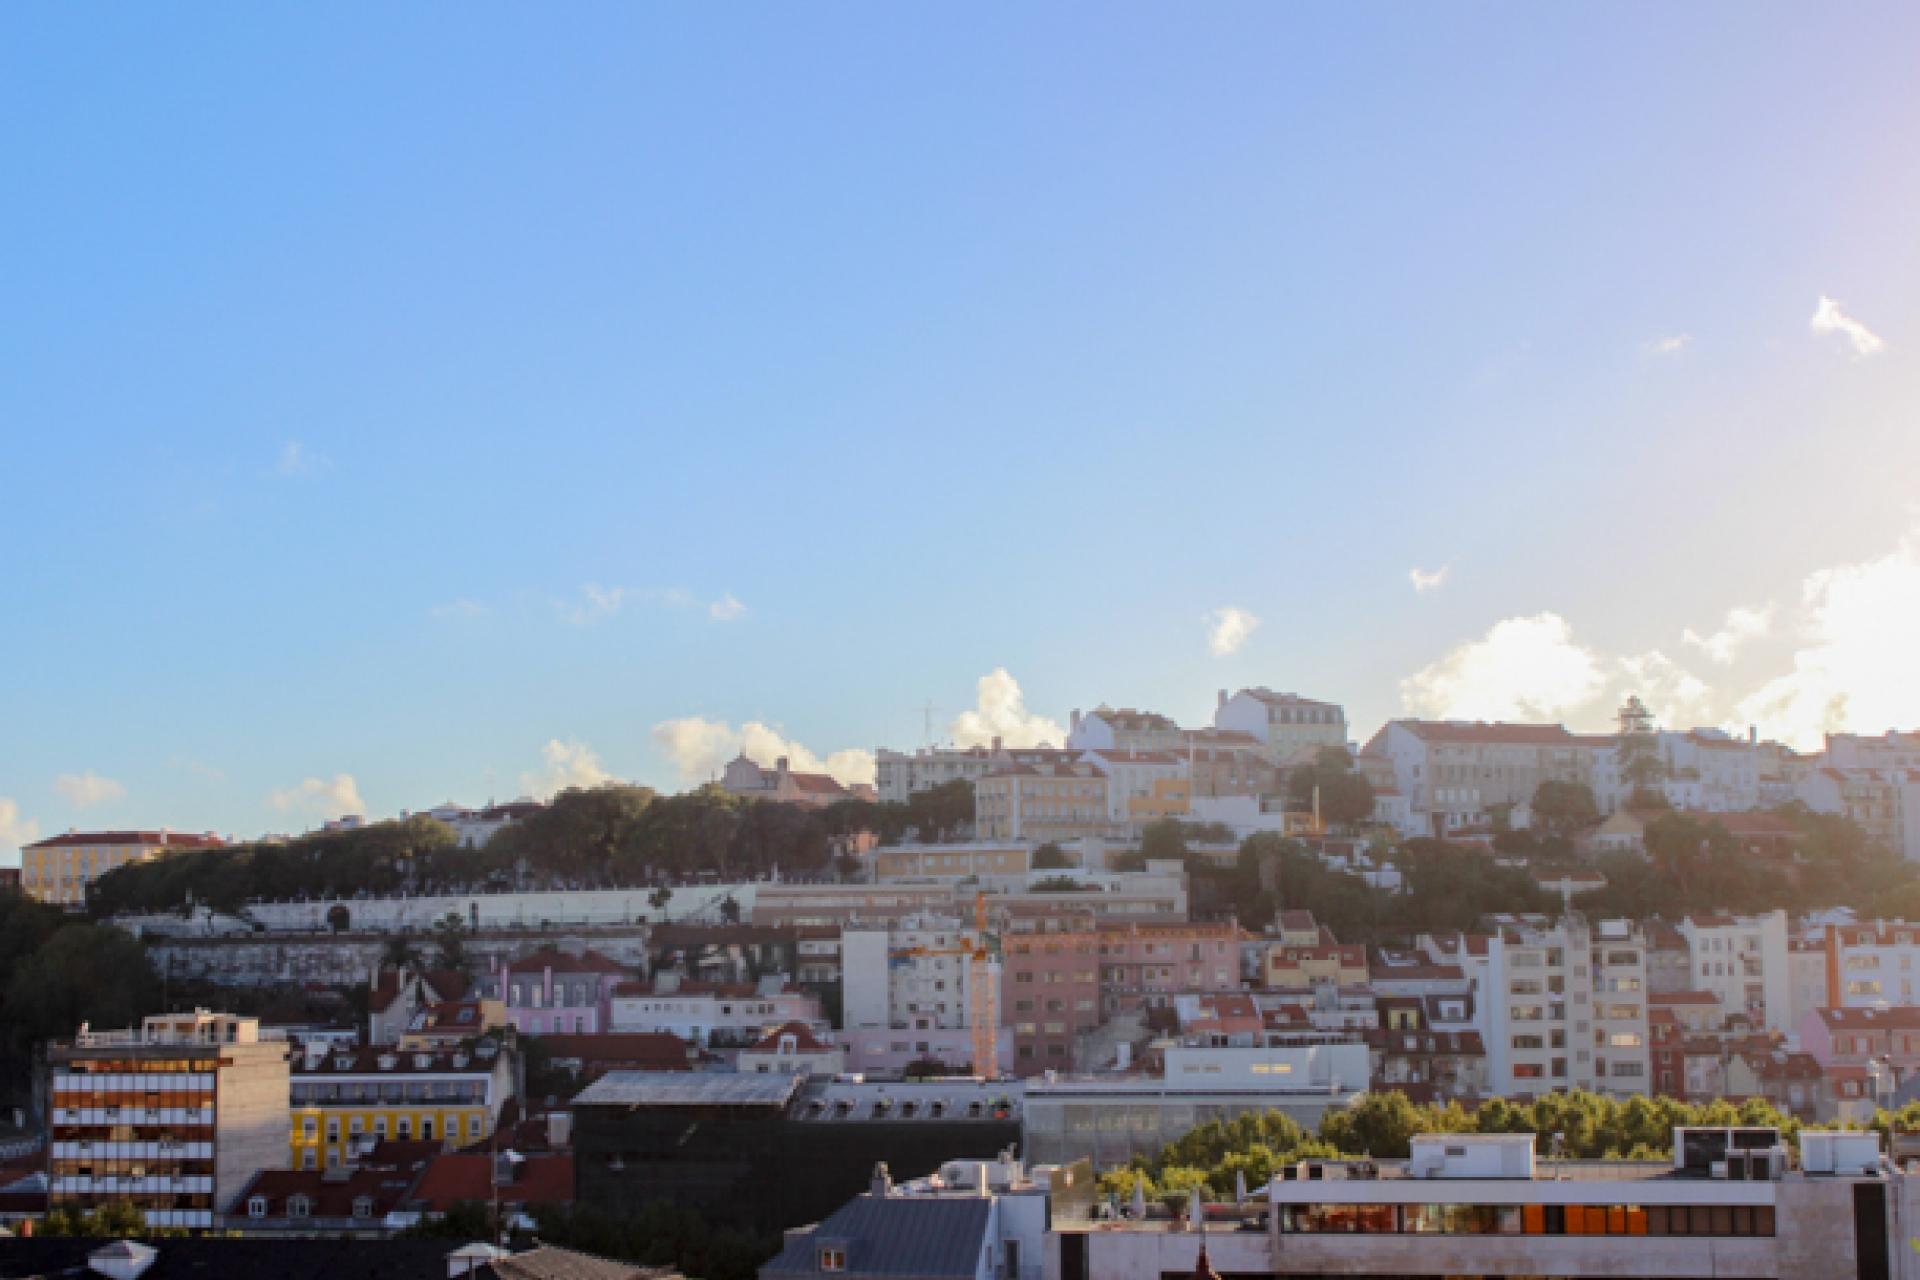 LisboaCool_Visitar_Miradouro Torel